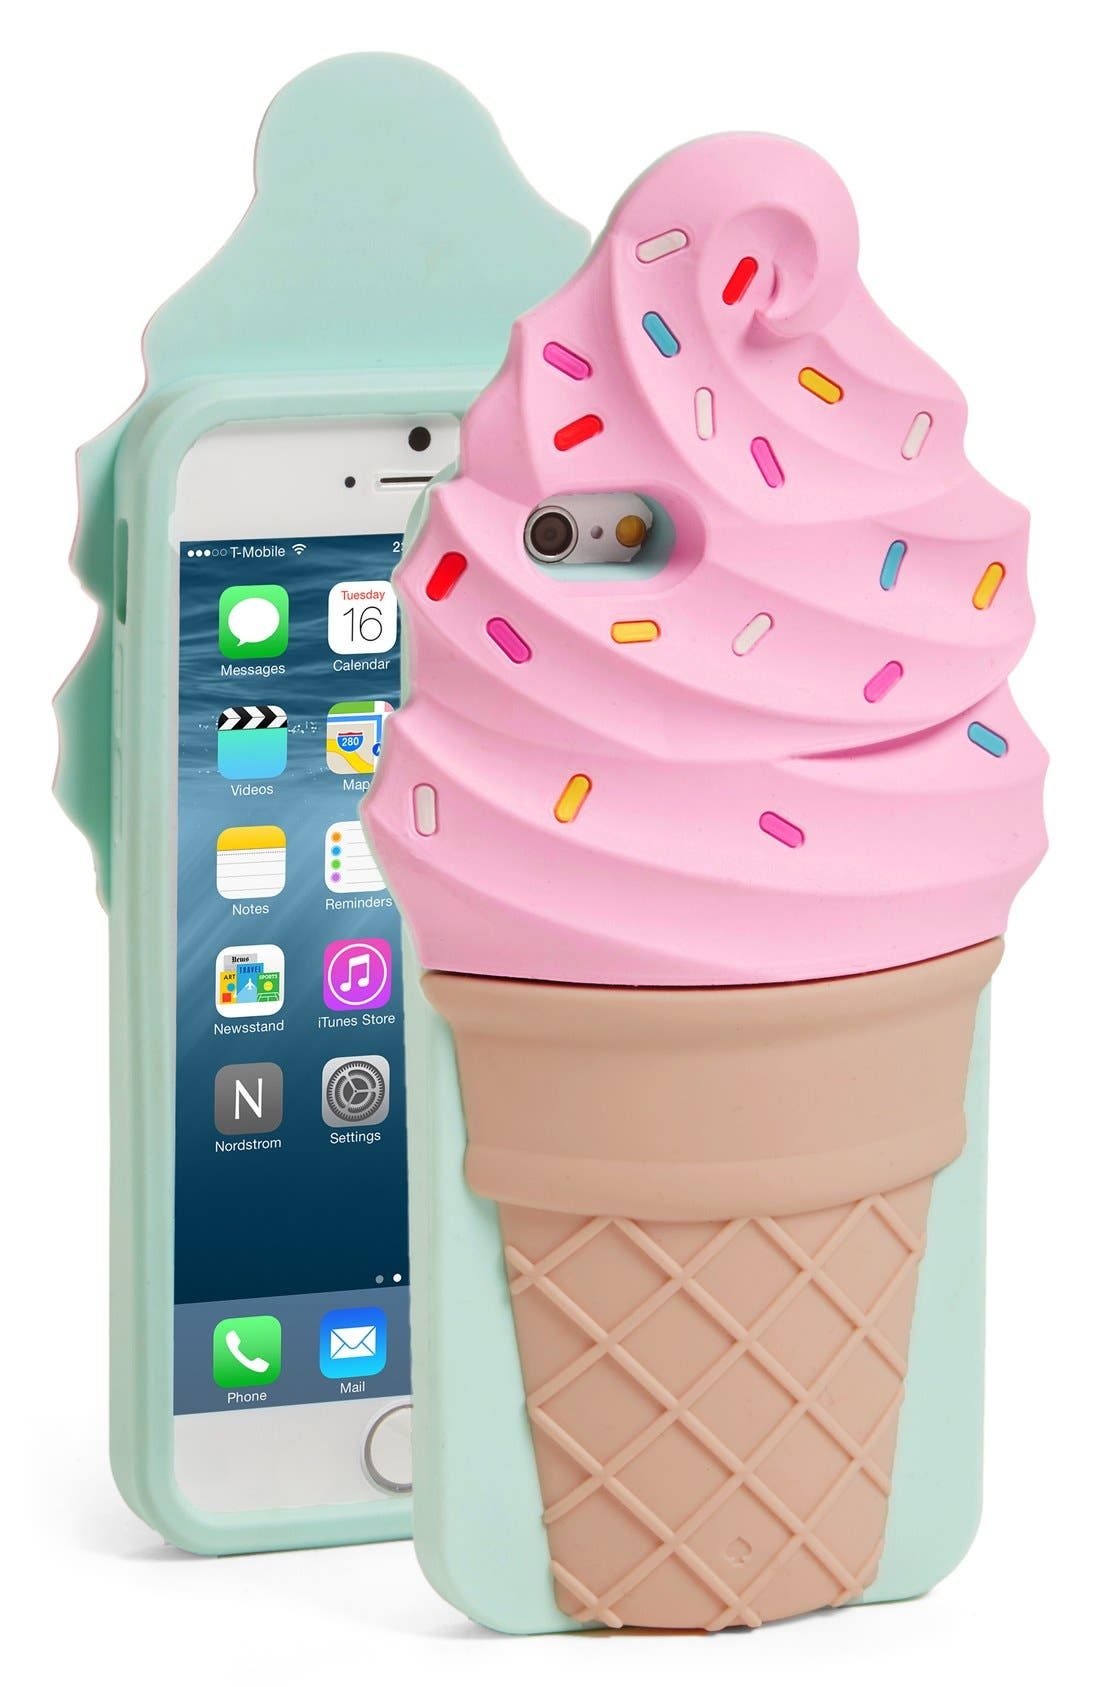 Alternate Image 1 Selected - kate spade new york 'ice cream' iPhone 6 & 6s case